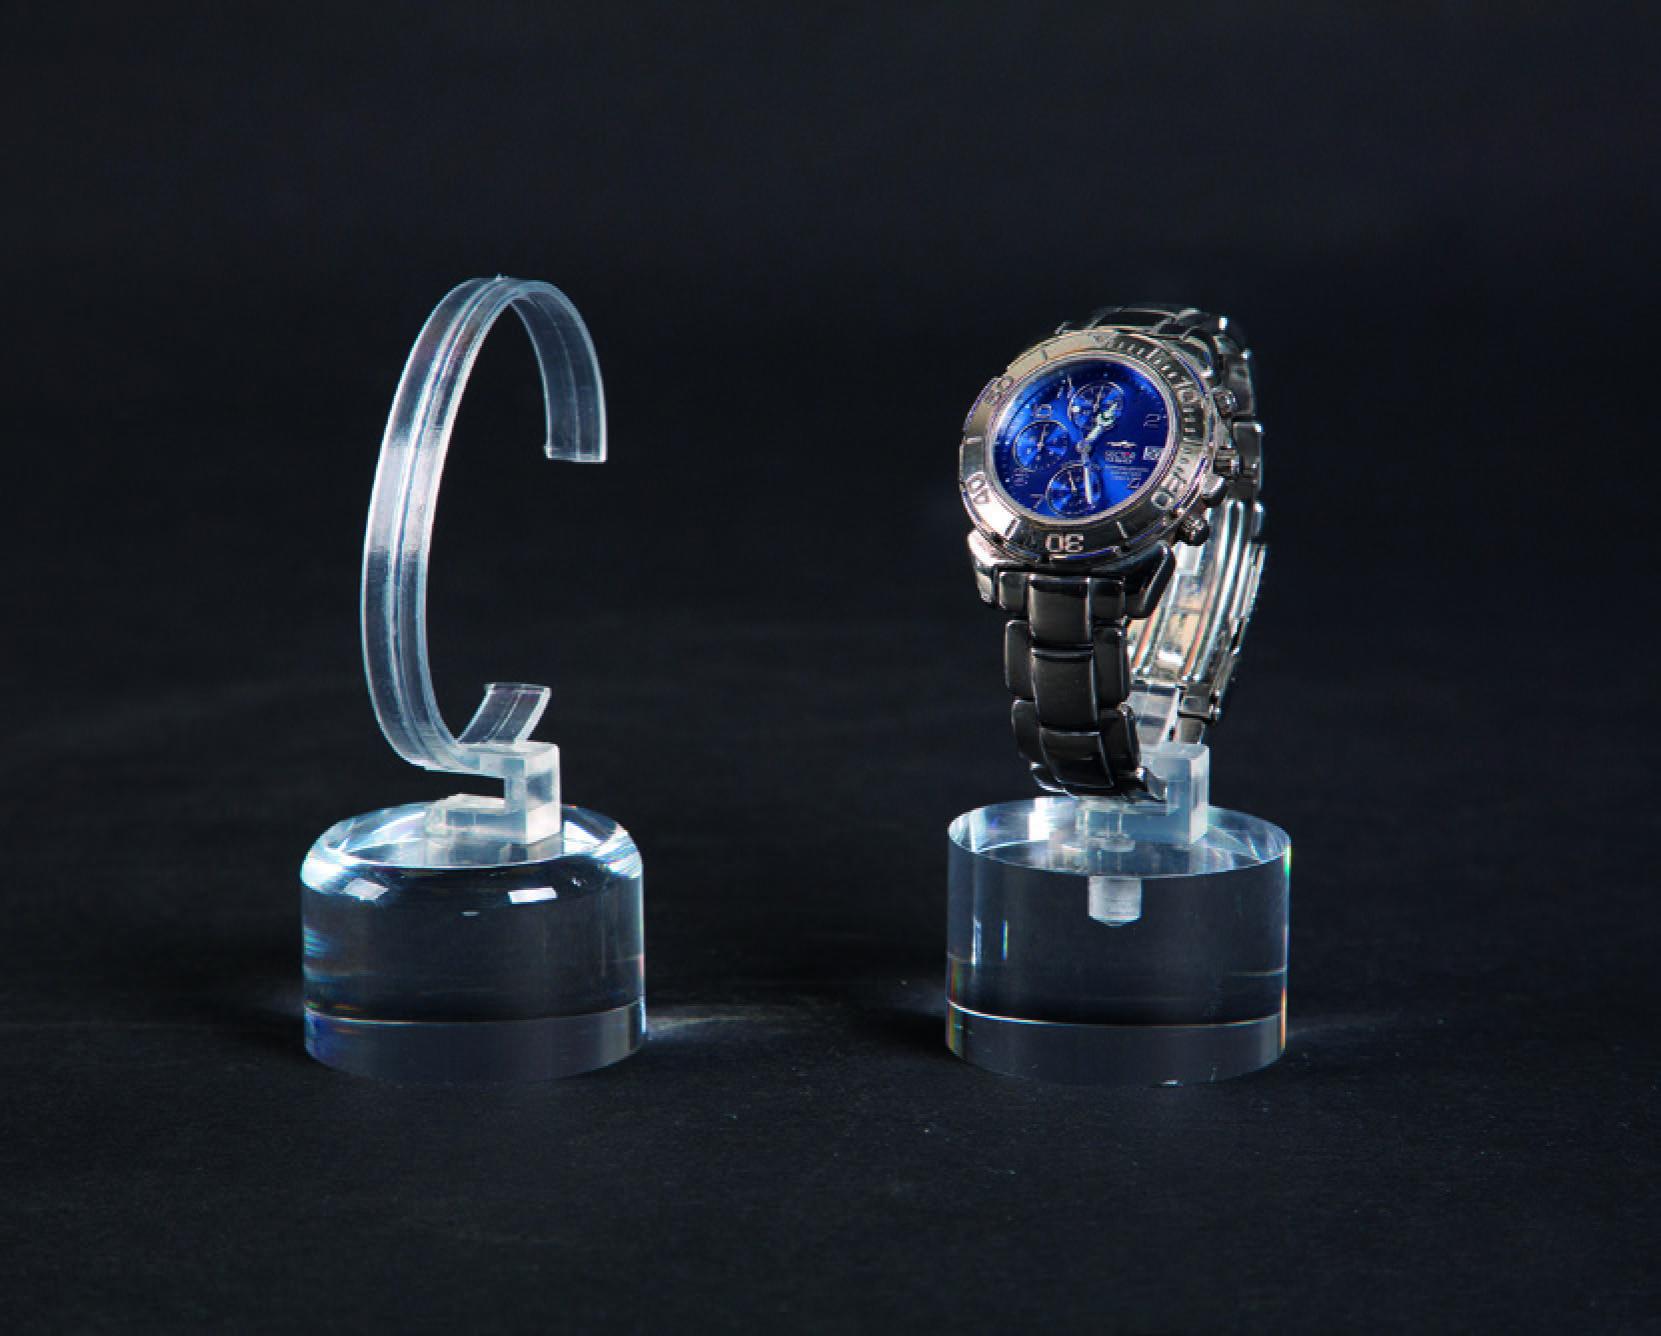 Espositori per orologi | Vendita Online | Vetrina S.P.